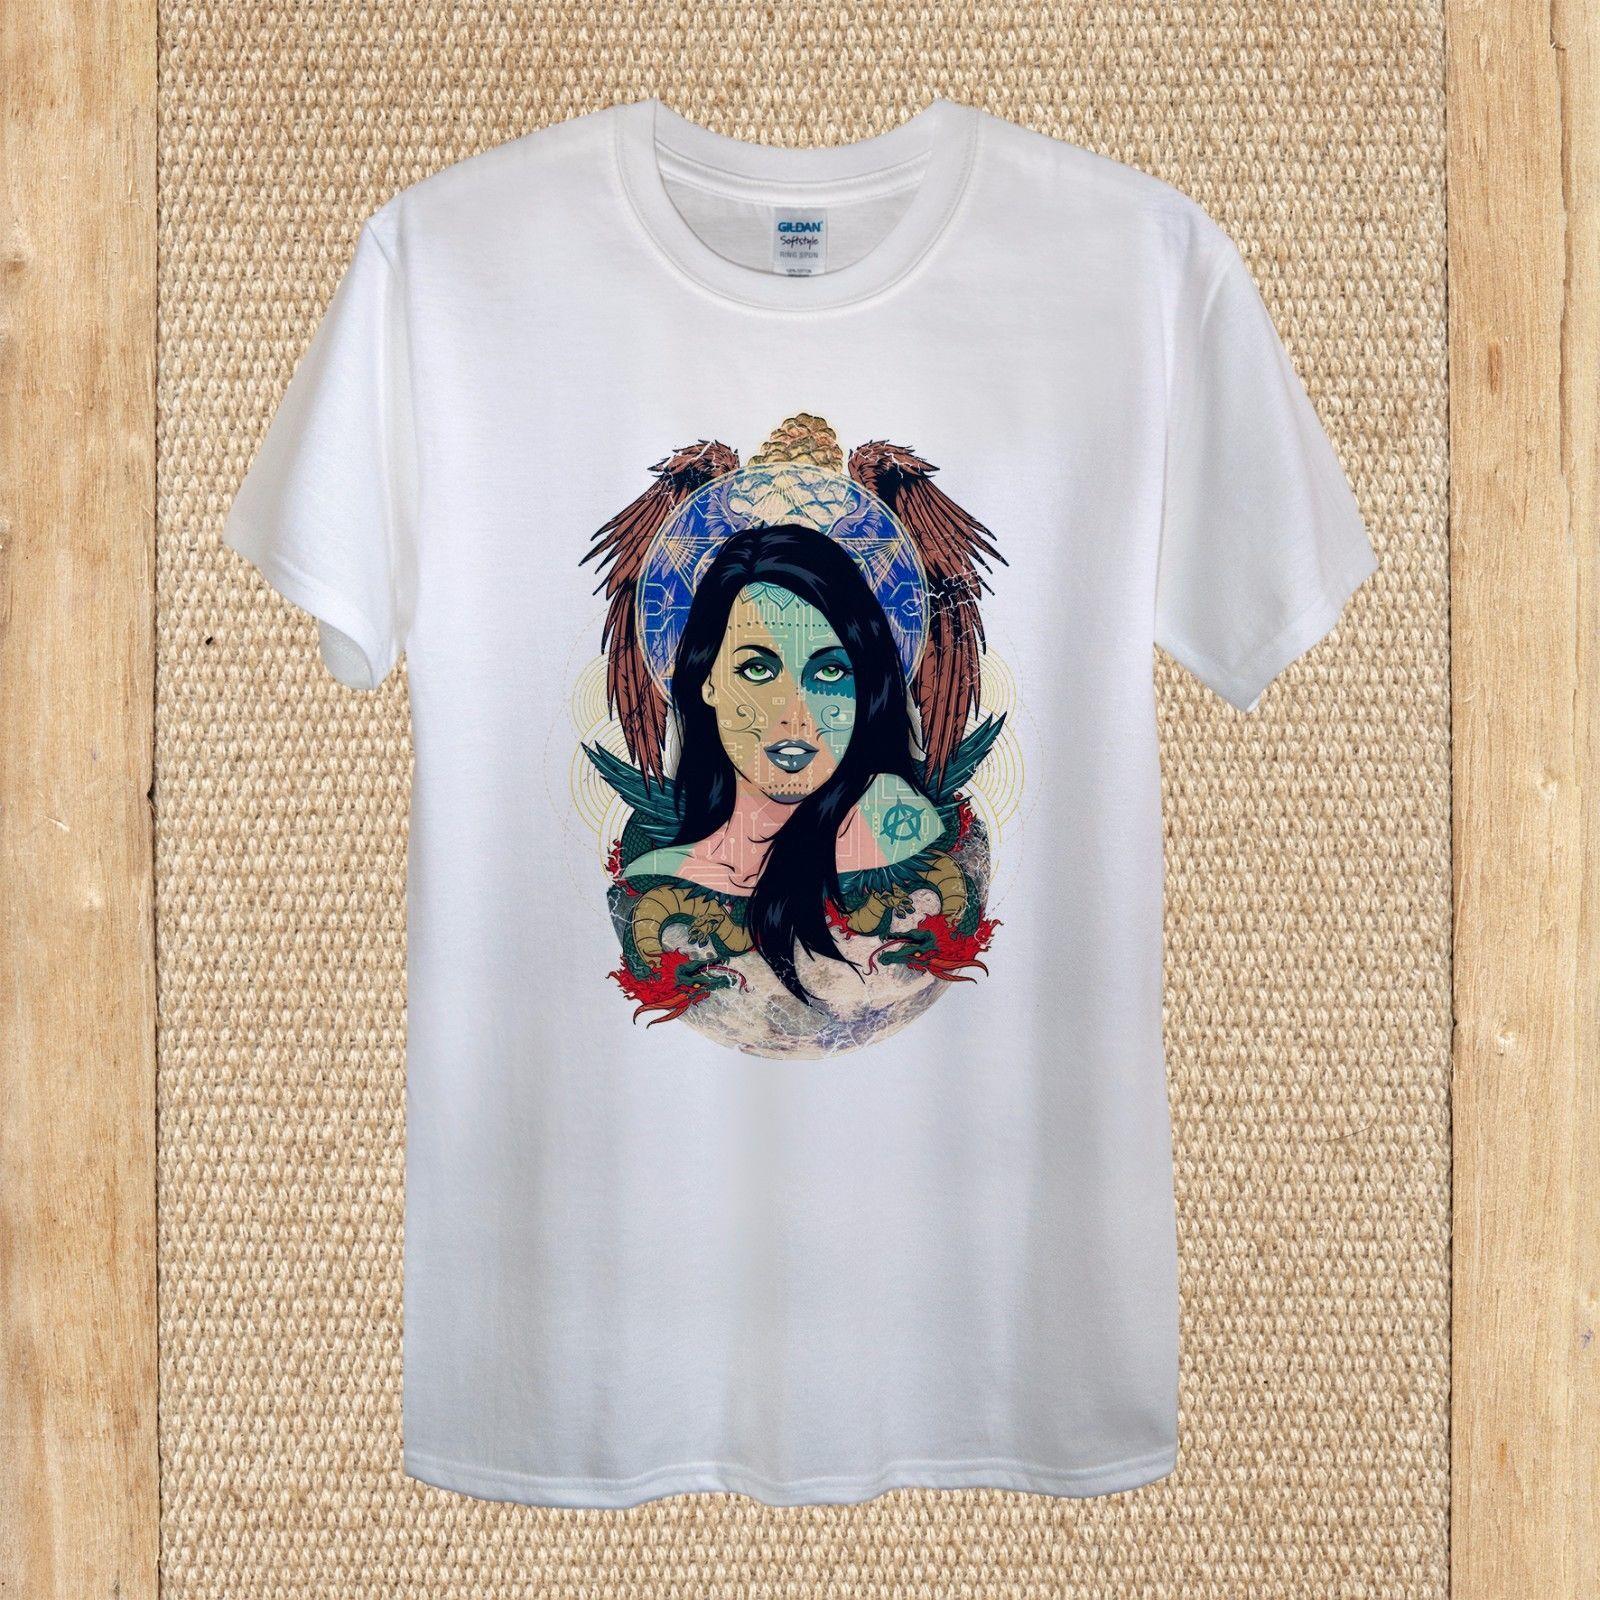 Moon Spirit Creative T Shirt Design Cool High Quality Unisex Women